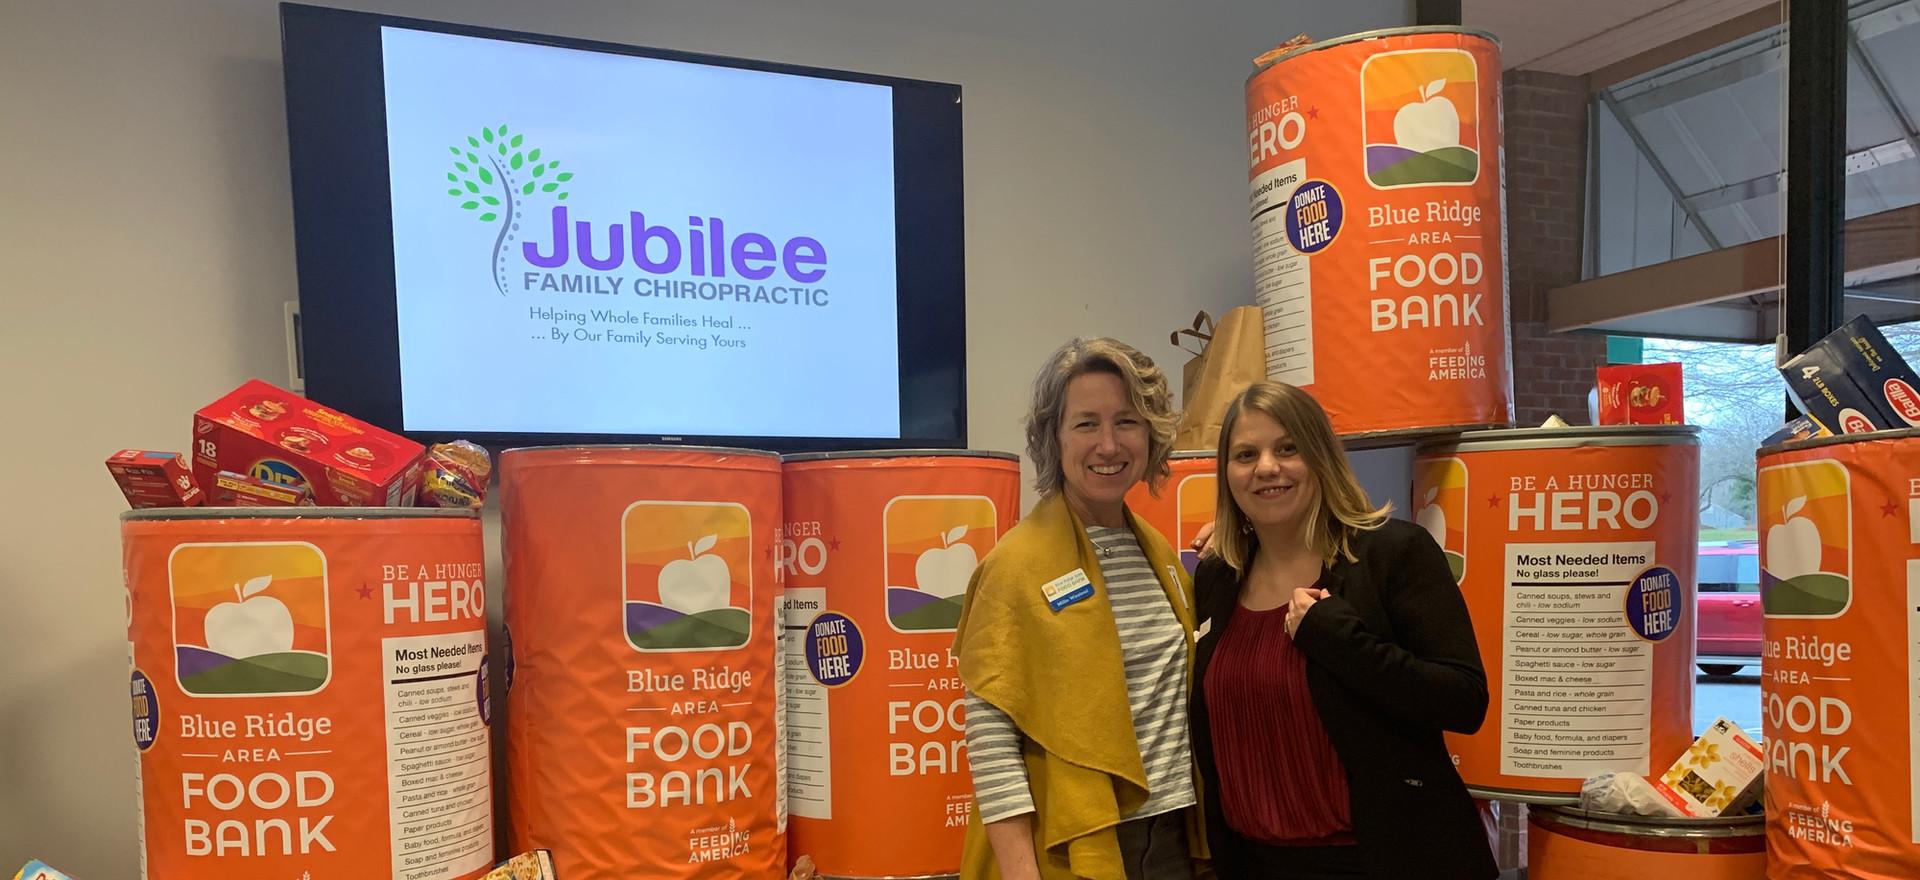 Jubilee Family Chiropractic 2020 Blue Ridge Food Drive. 033